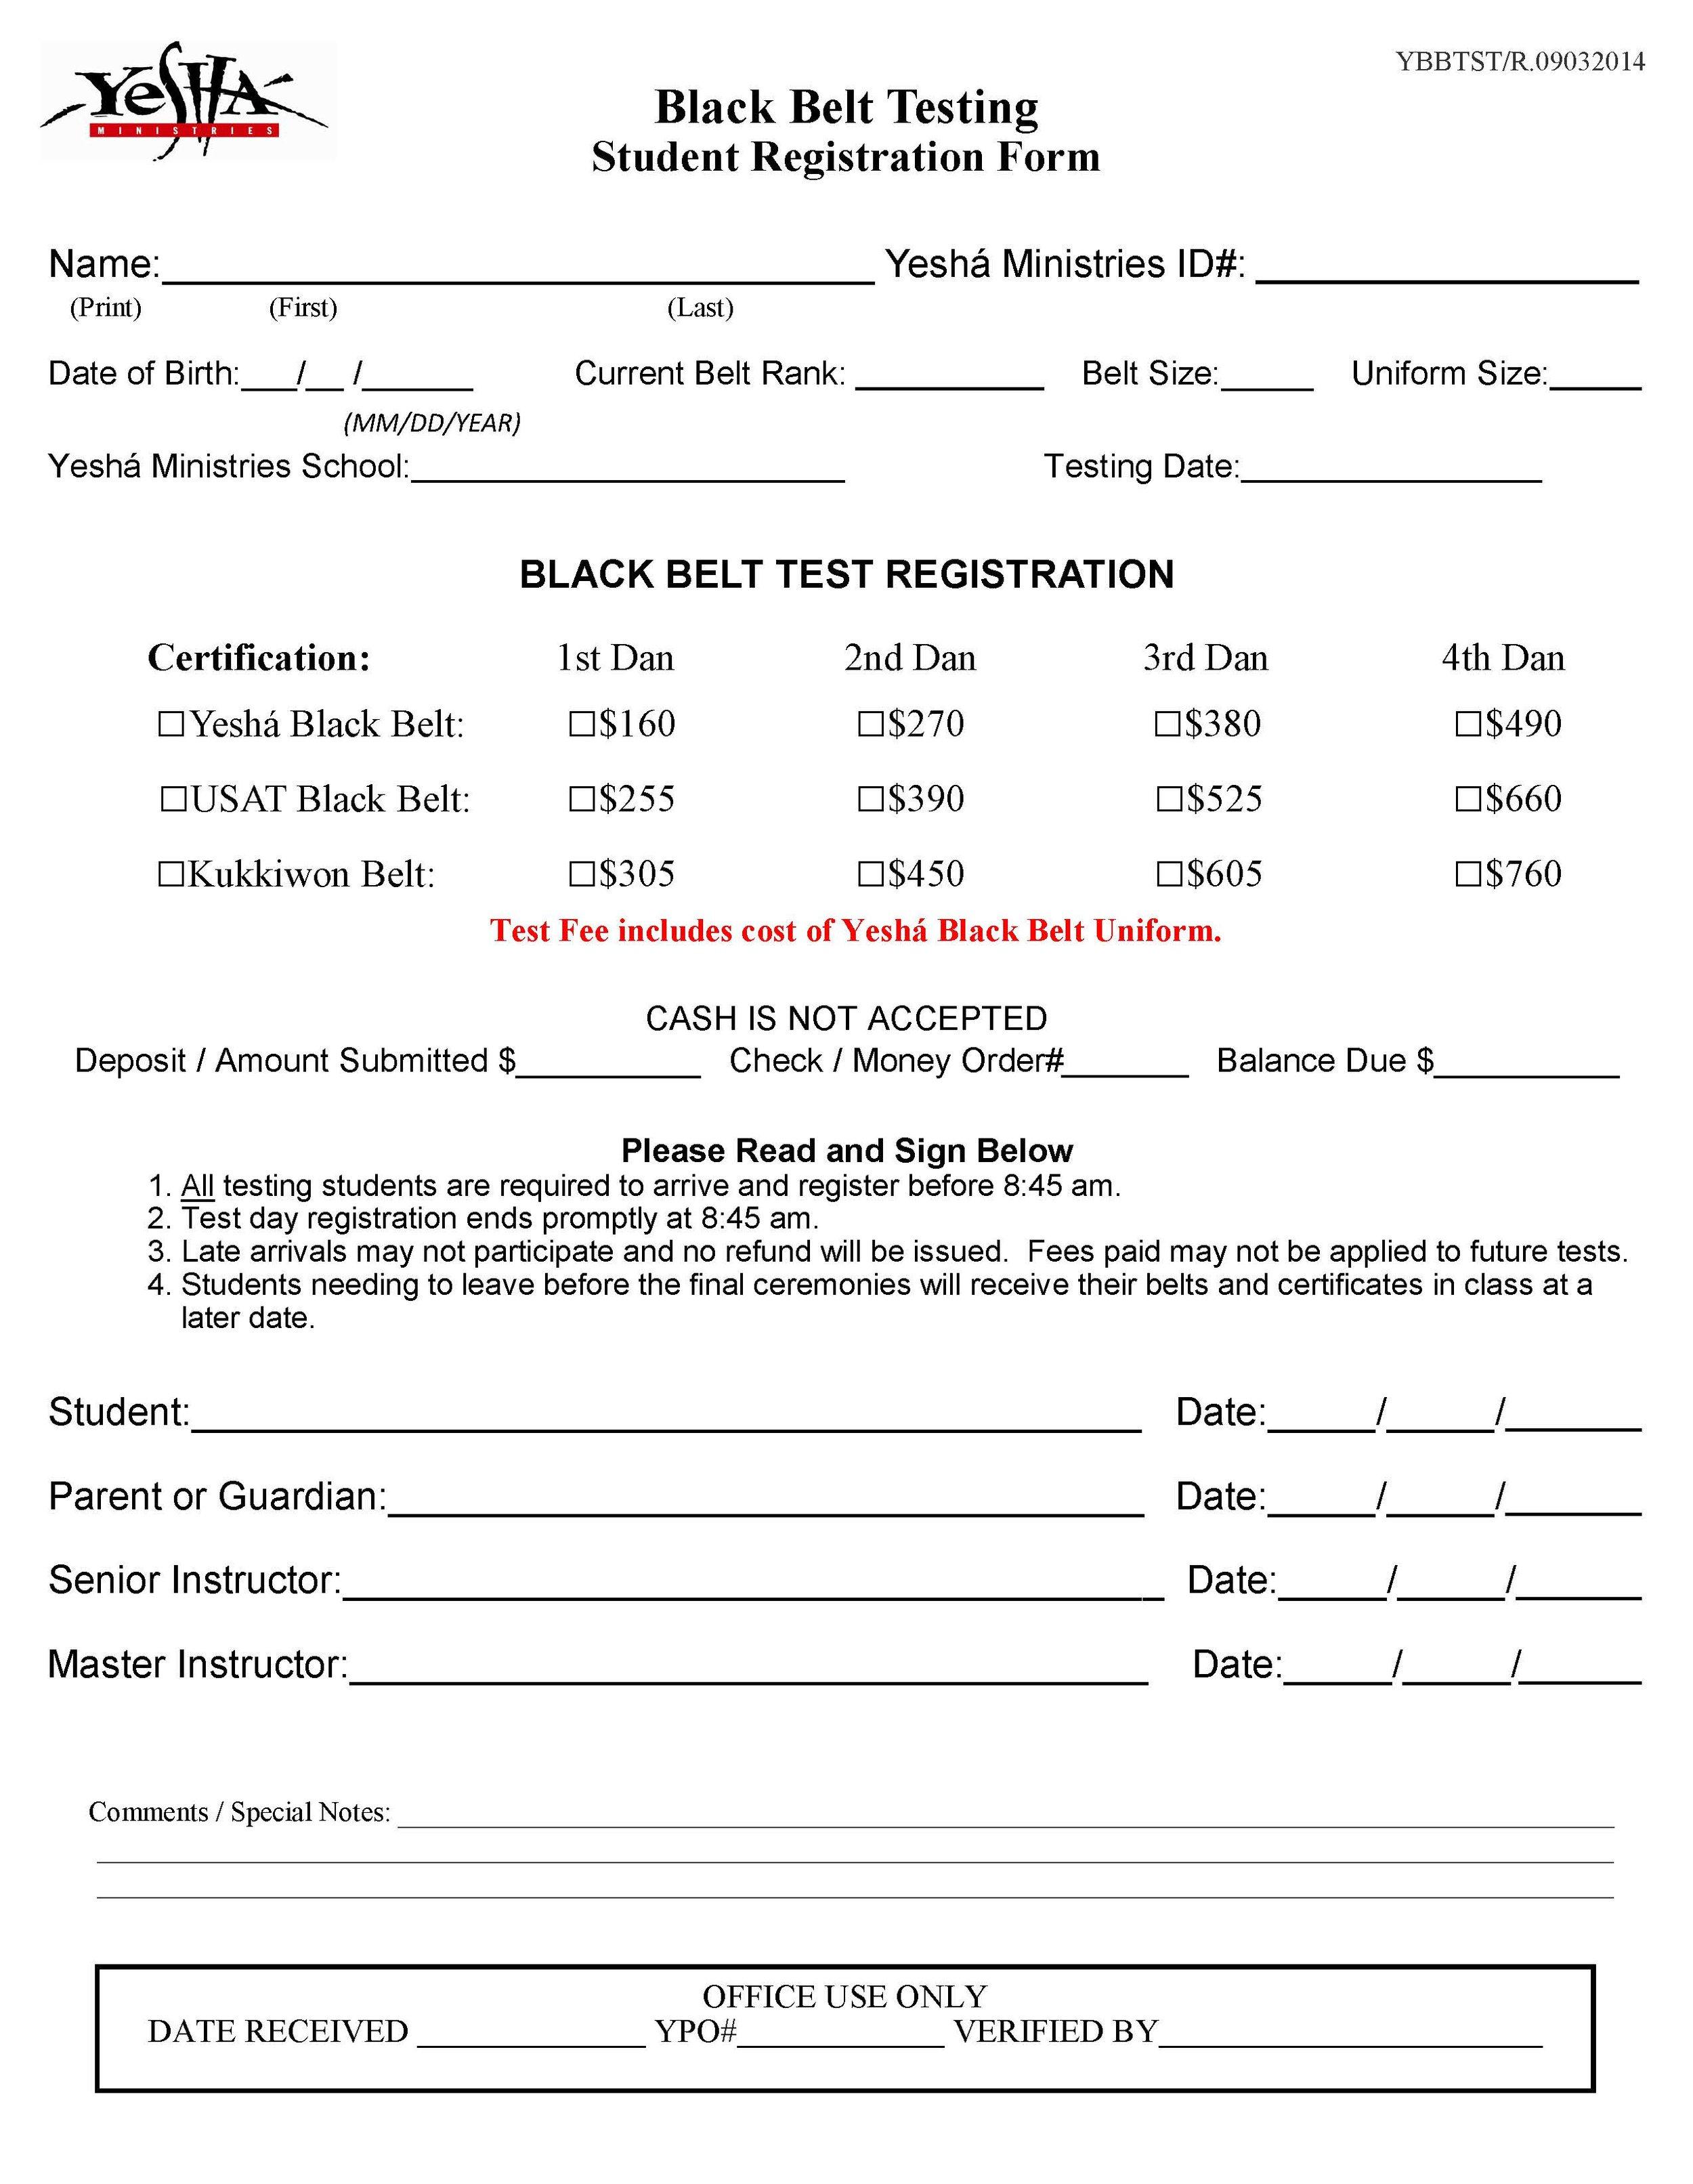 Black Belt Test Registration revSept2014.jpg